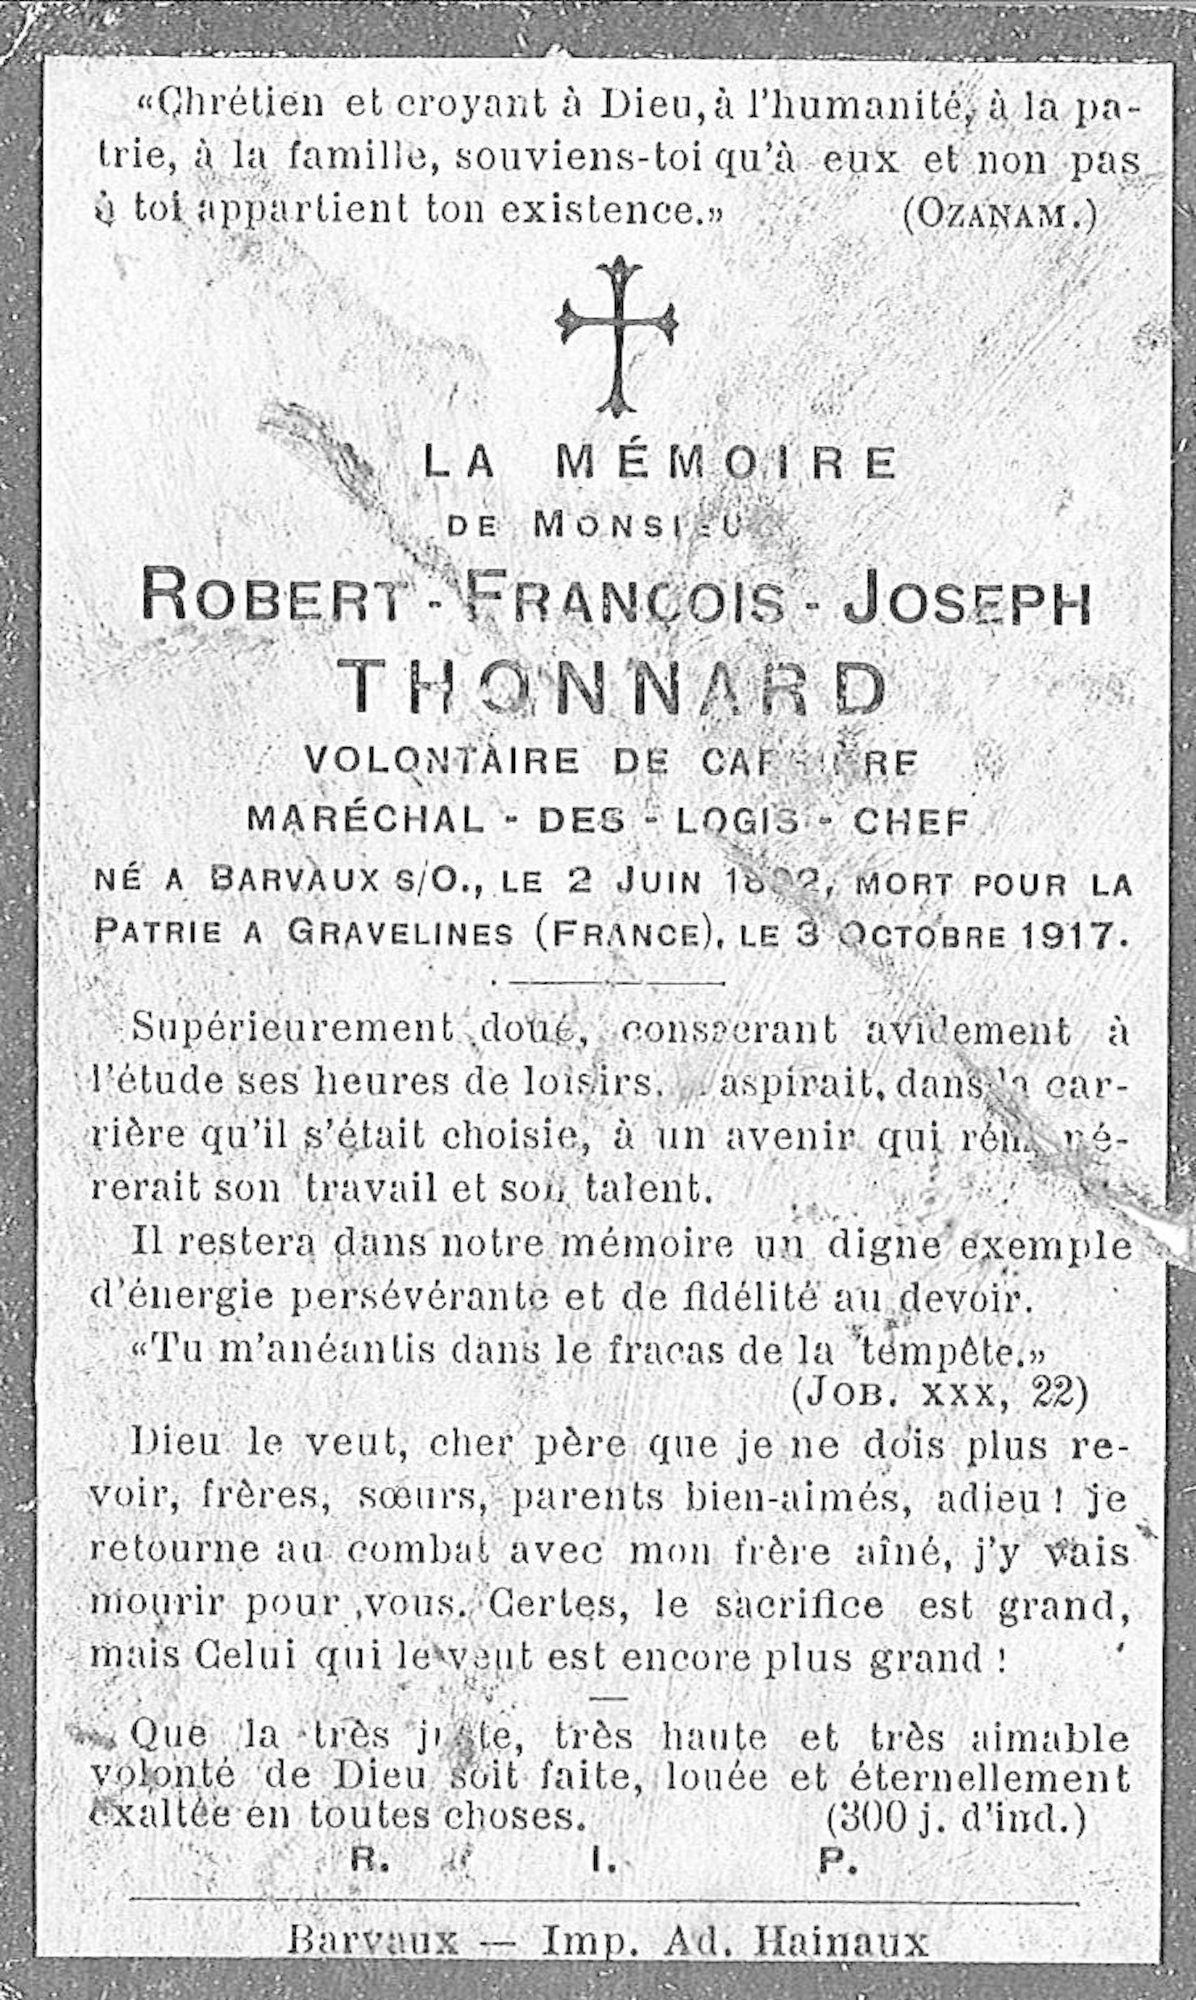 Robert-François-Joseph Thonnard